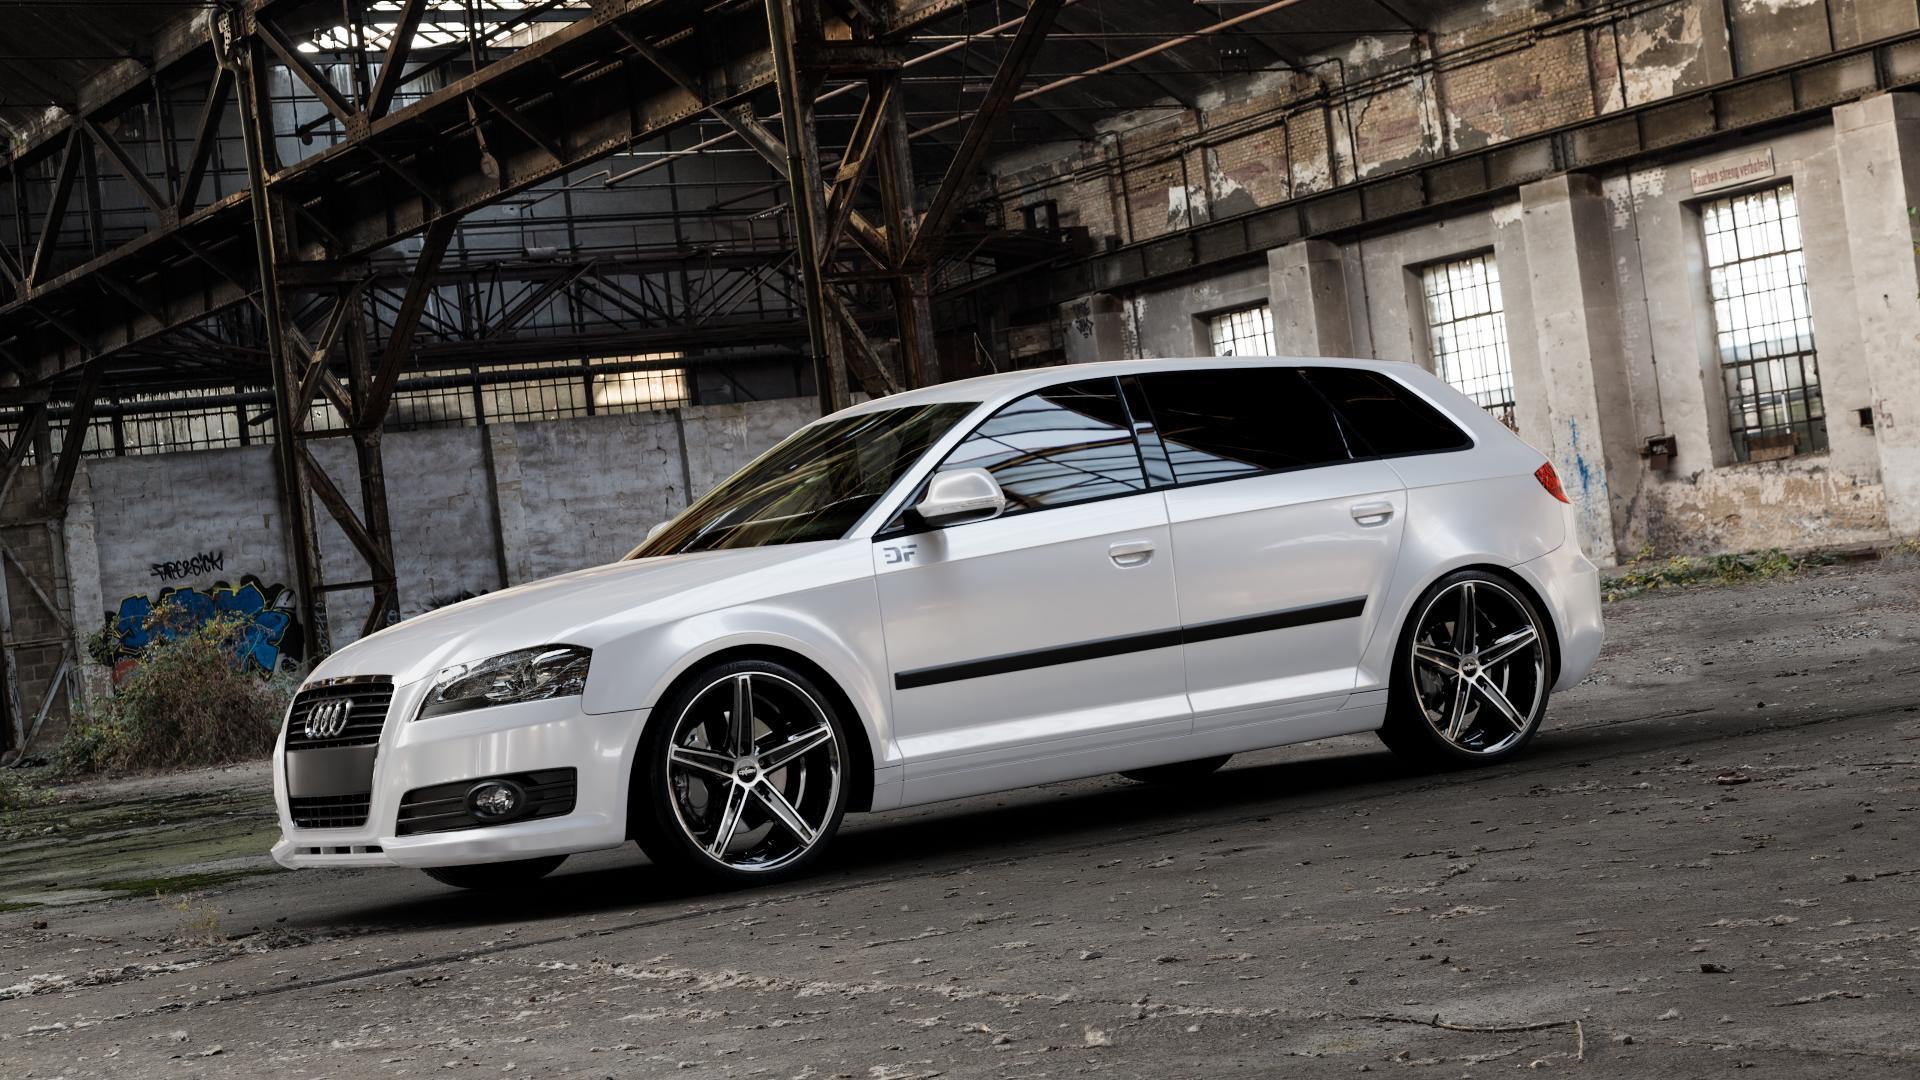 OXIGIN 18 Concave black full polish Felge mit Reifen silber schwarz mehrfarbig in 19Zoll Alufelge auf weissem Audi A3 Typ 8P (Sportback) 1,6l 75kW (102 PS) 2,0l FSI 110kW (150 1,9l TDI 77kW (105 103kW (140 TFSI 147kW (200 85kW (116 100kW (136 1,8l 118kW (160 125kW (170 1,4l 92kW (125 120kW (163 quattro 3,2l V6 184kW (250 S3 195kW (265 1,2l 66kW (90 18